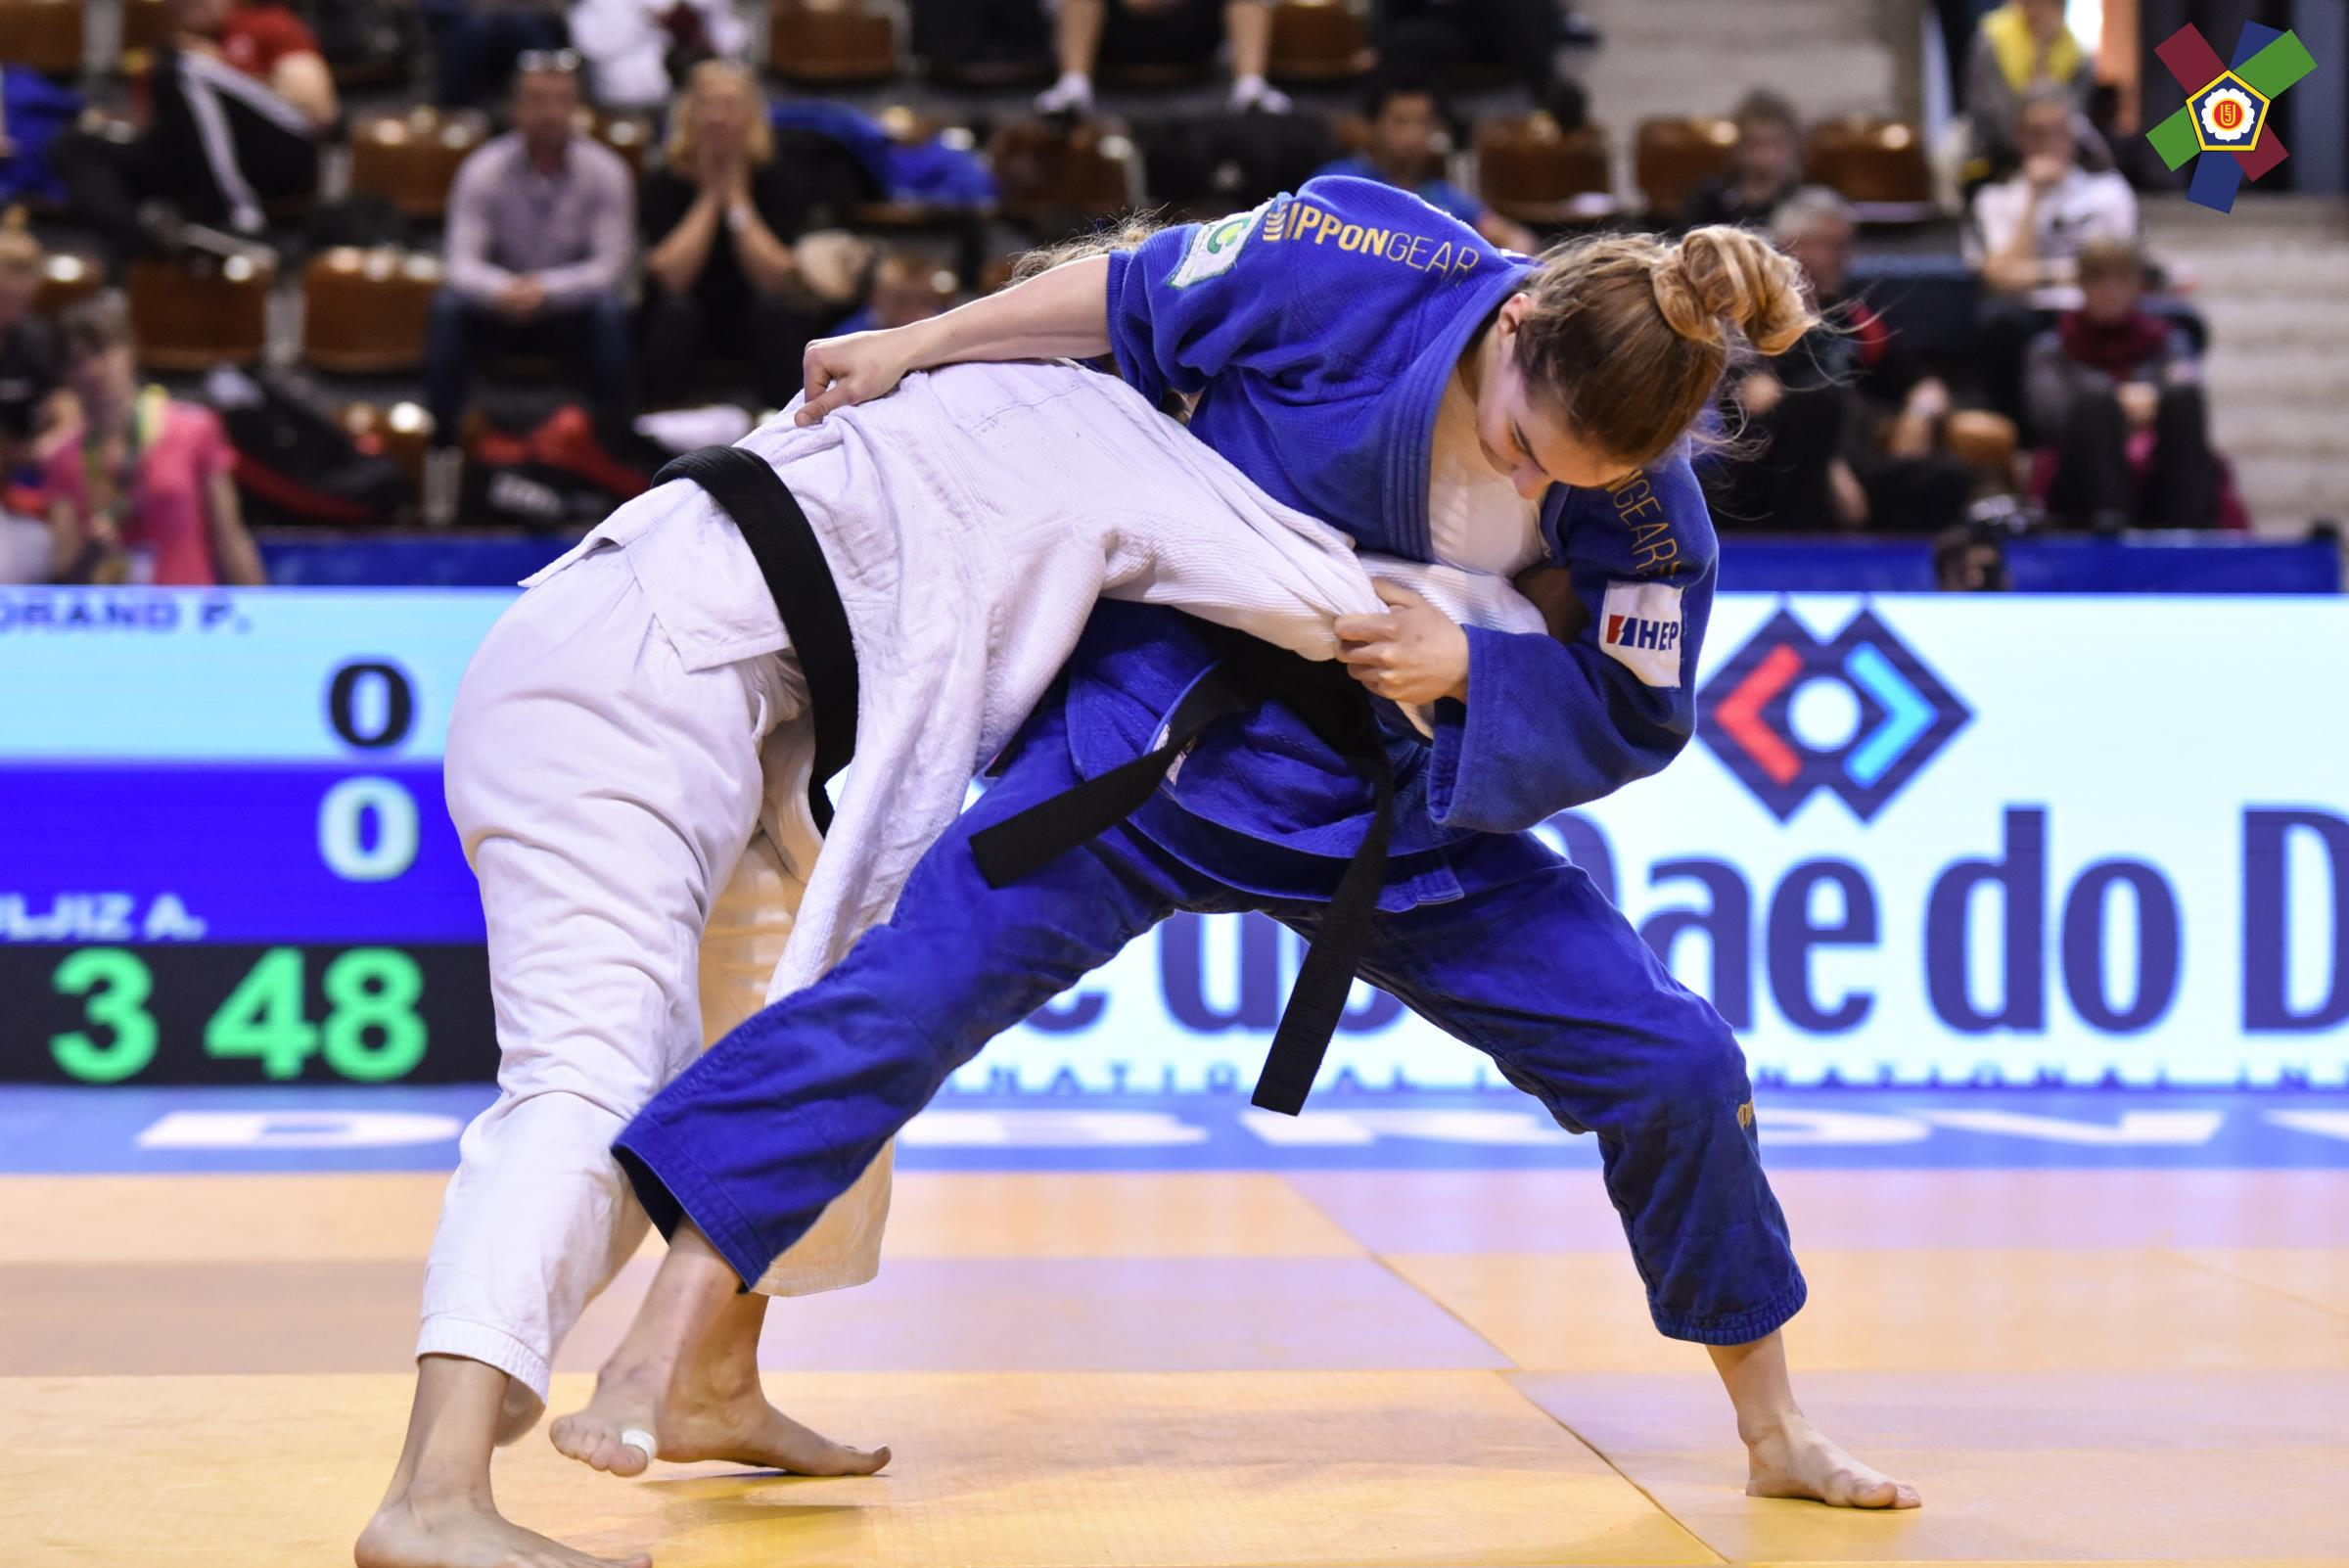 EJU-Judo-Senior-European-Cup-Dubrovnik-2019-Puljiz-2